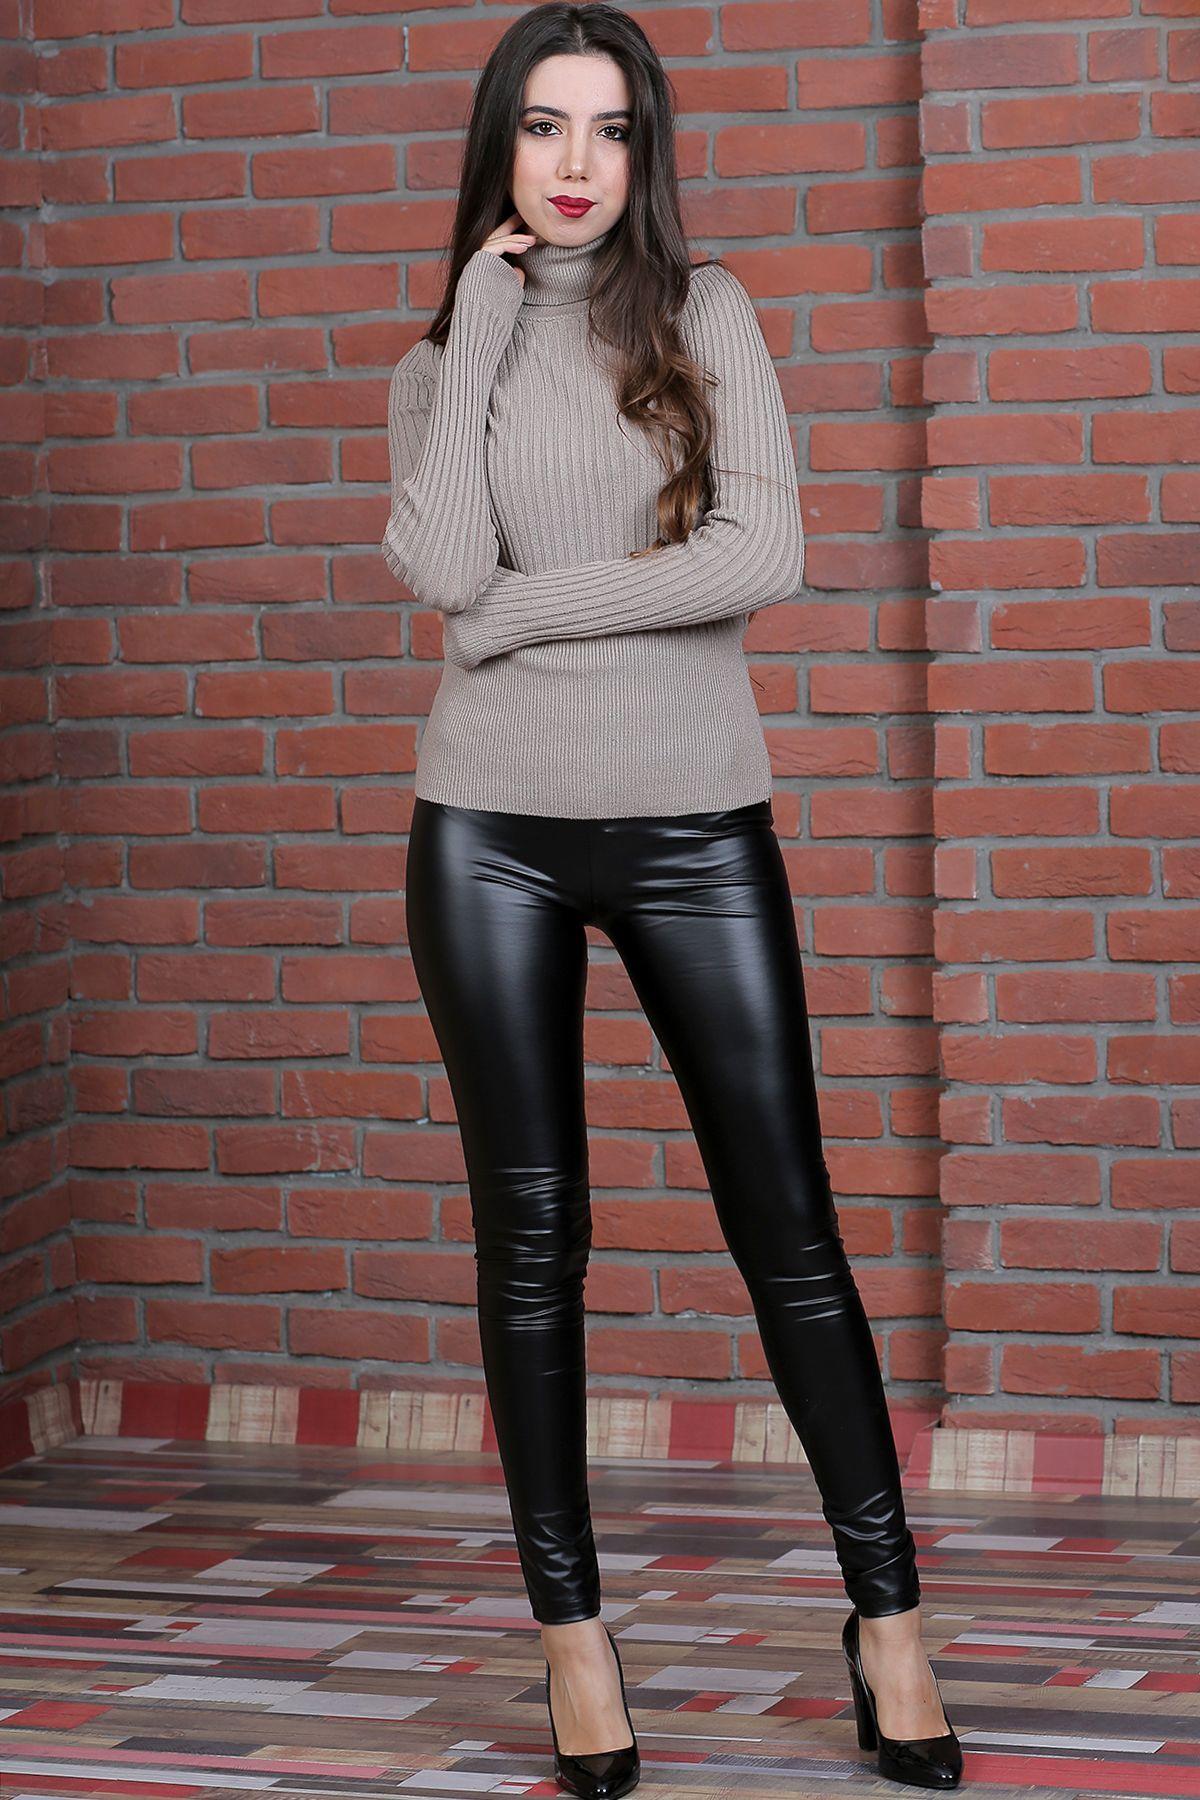 Genis Kemer Duz Bayan Deri Tayt Kadin Giyim Taytlar Moda